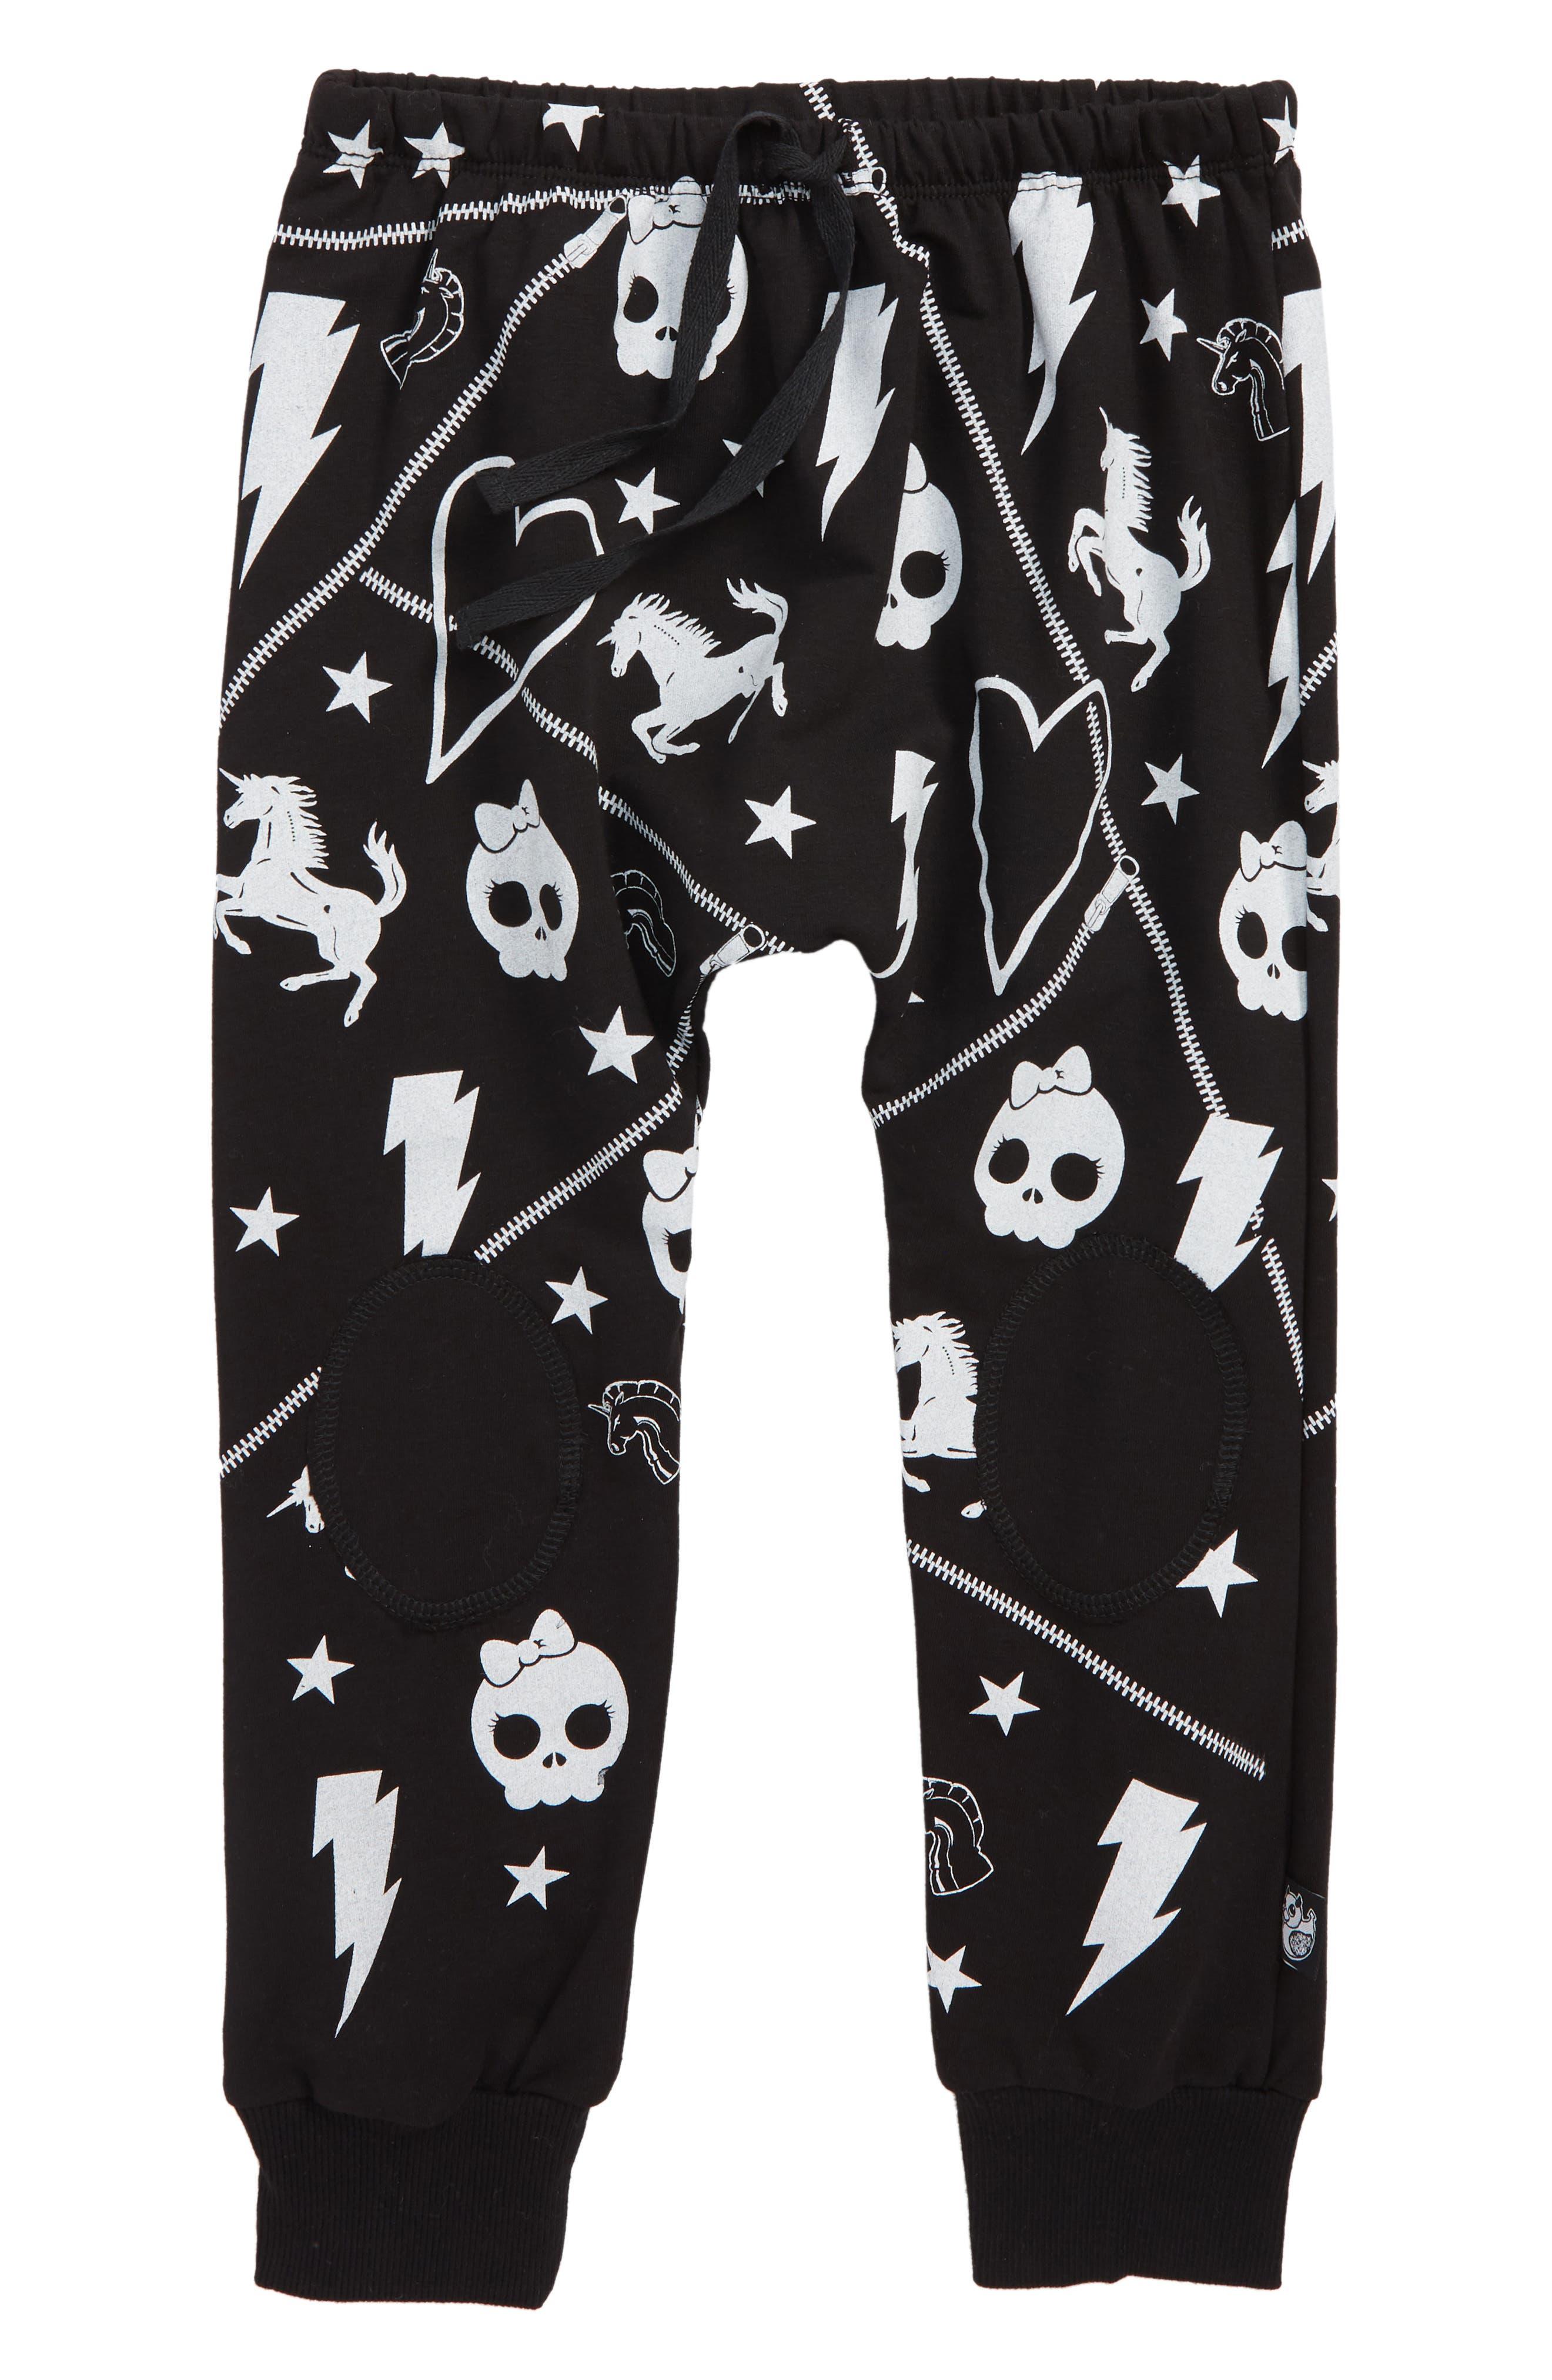 Skulls and Stars Sweatpants,                             Main thumbnail 1, color,                             BLACK